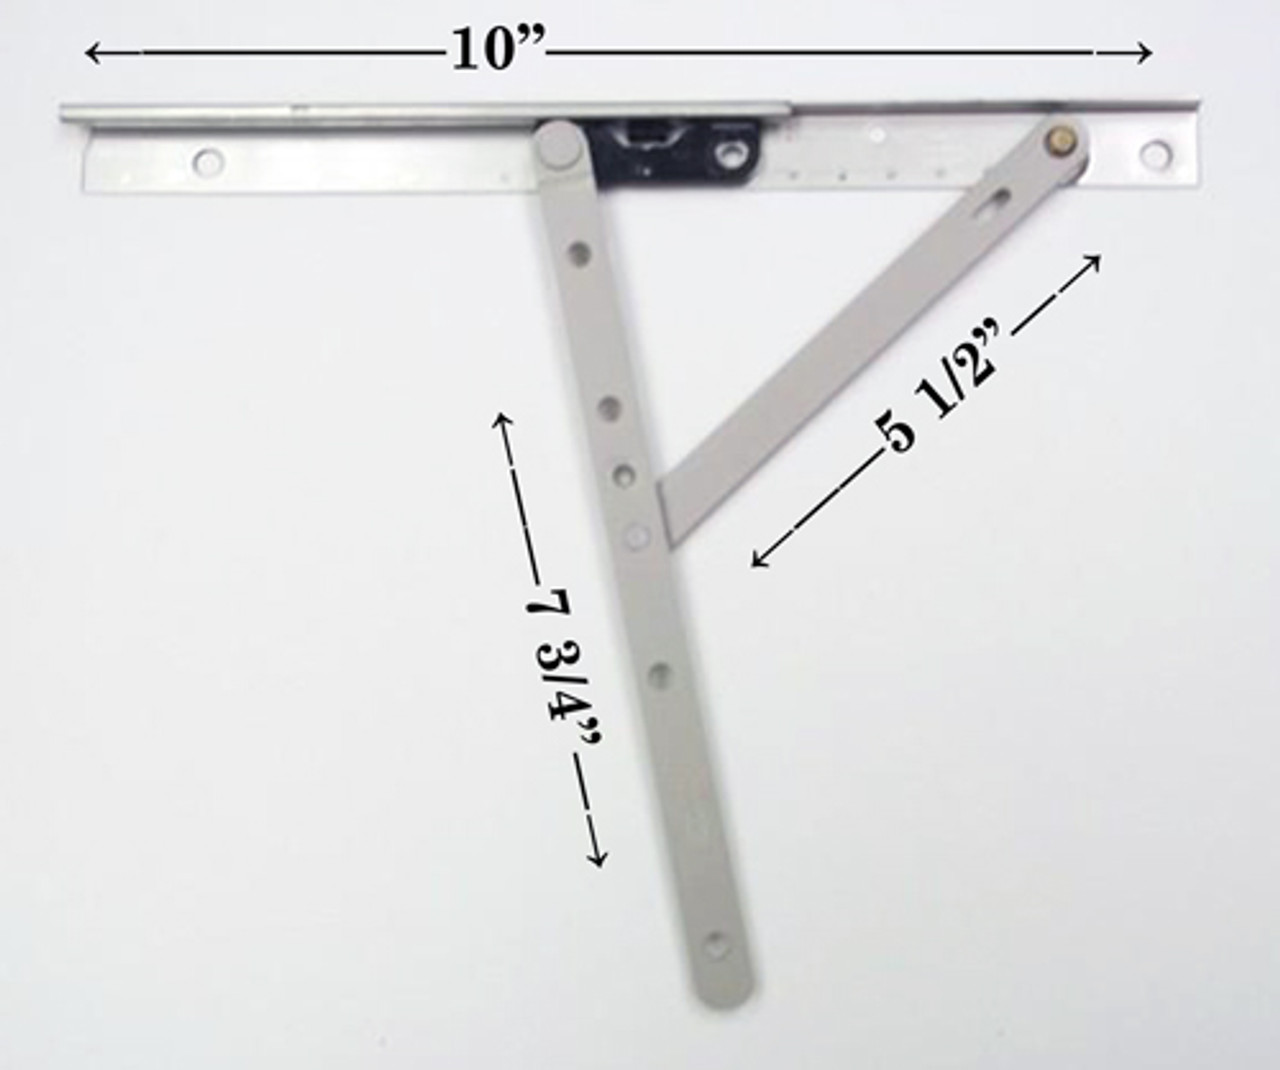 Top & bottom set hinge arm & track - 2176960,2176953,2173537,2173544